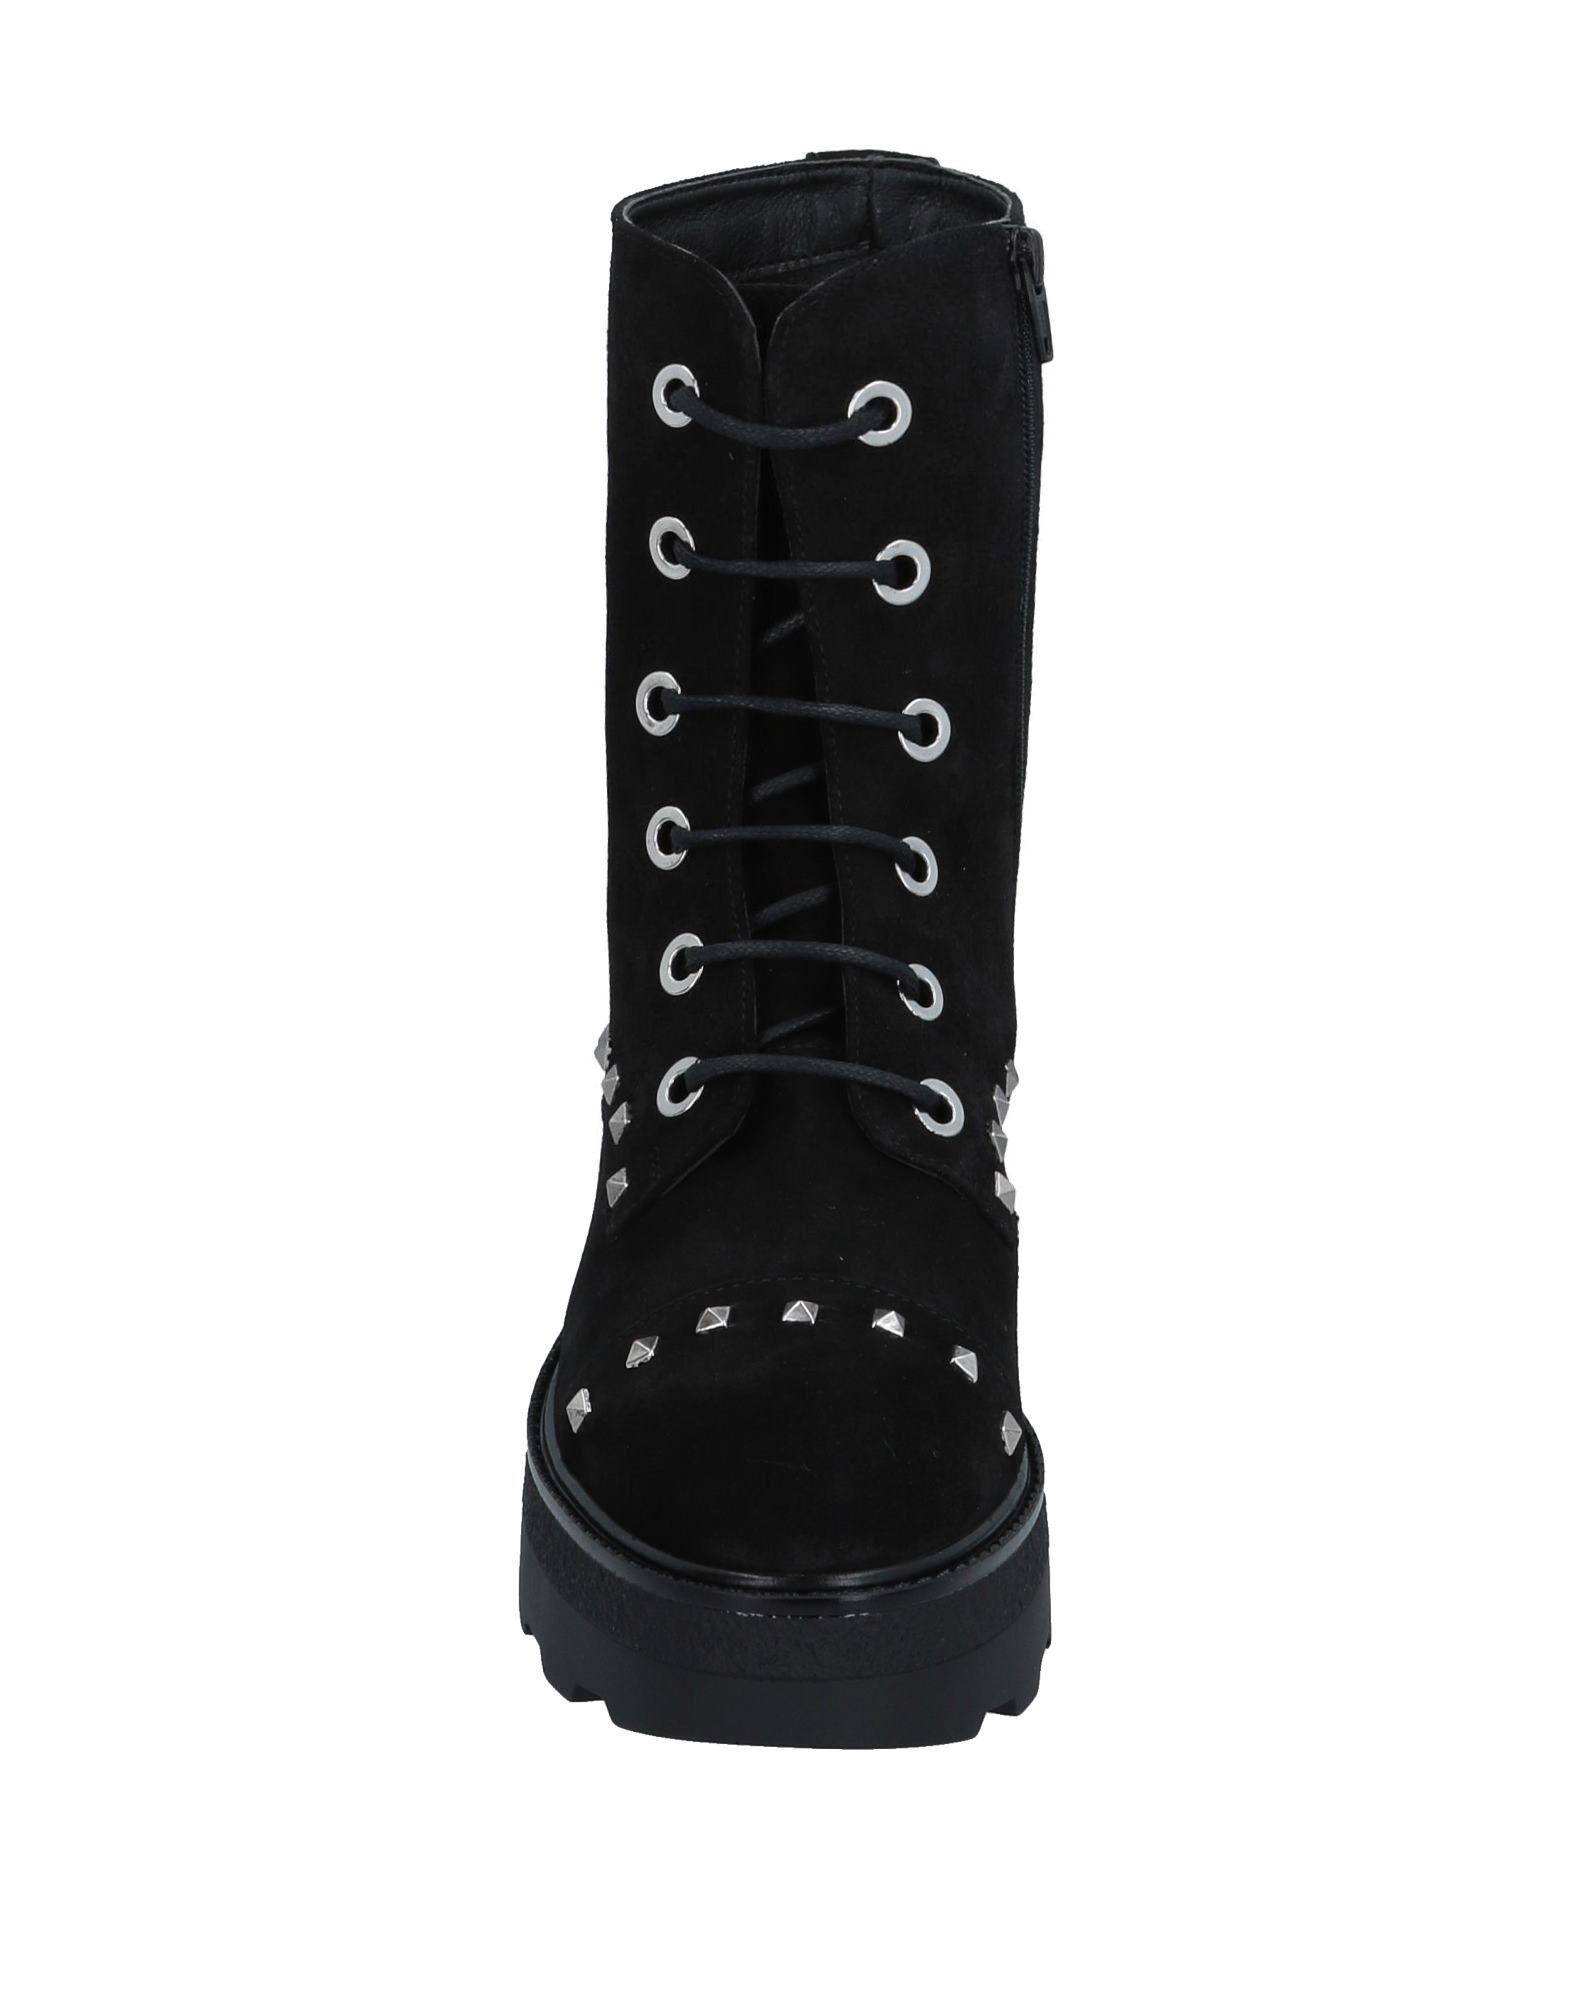 Eliana 11532287GA Bucci Stiefelette Damen  11532287GA Eliana Gute Qualität beliebte Schuhe c2750f